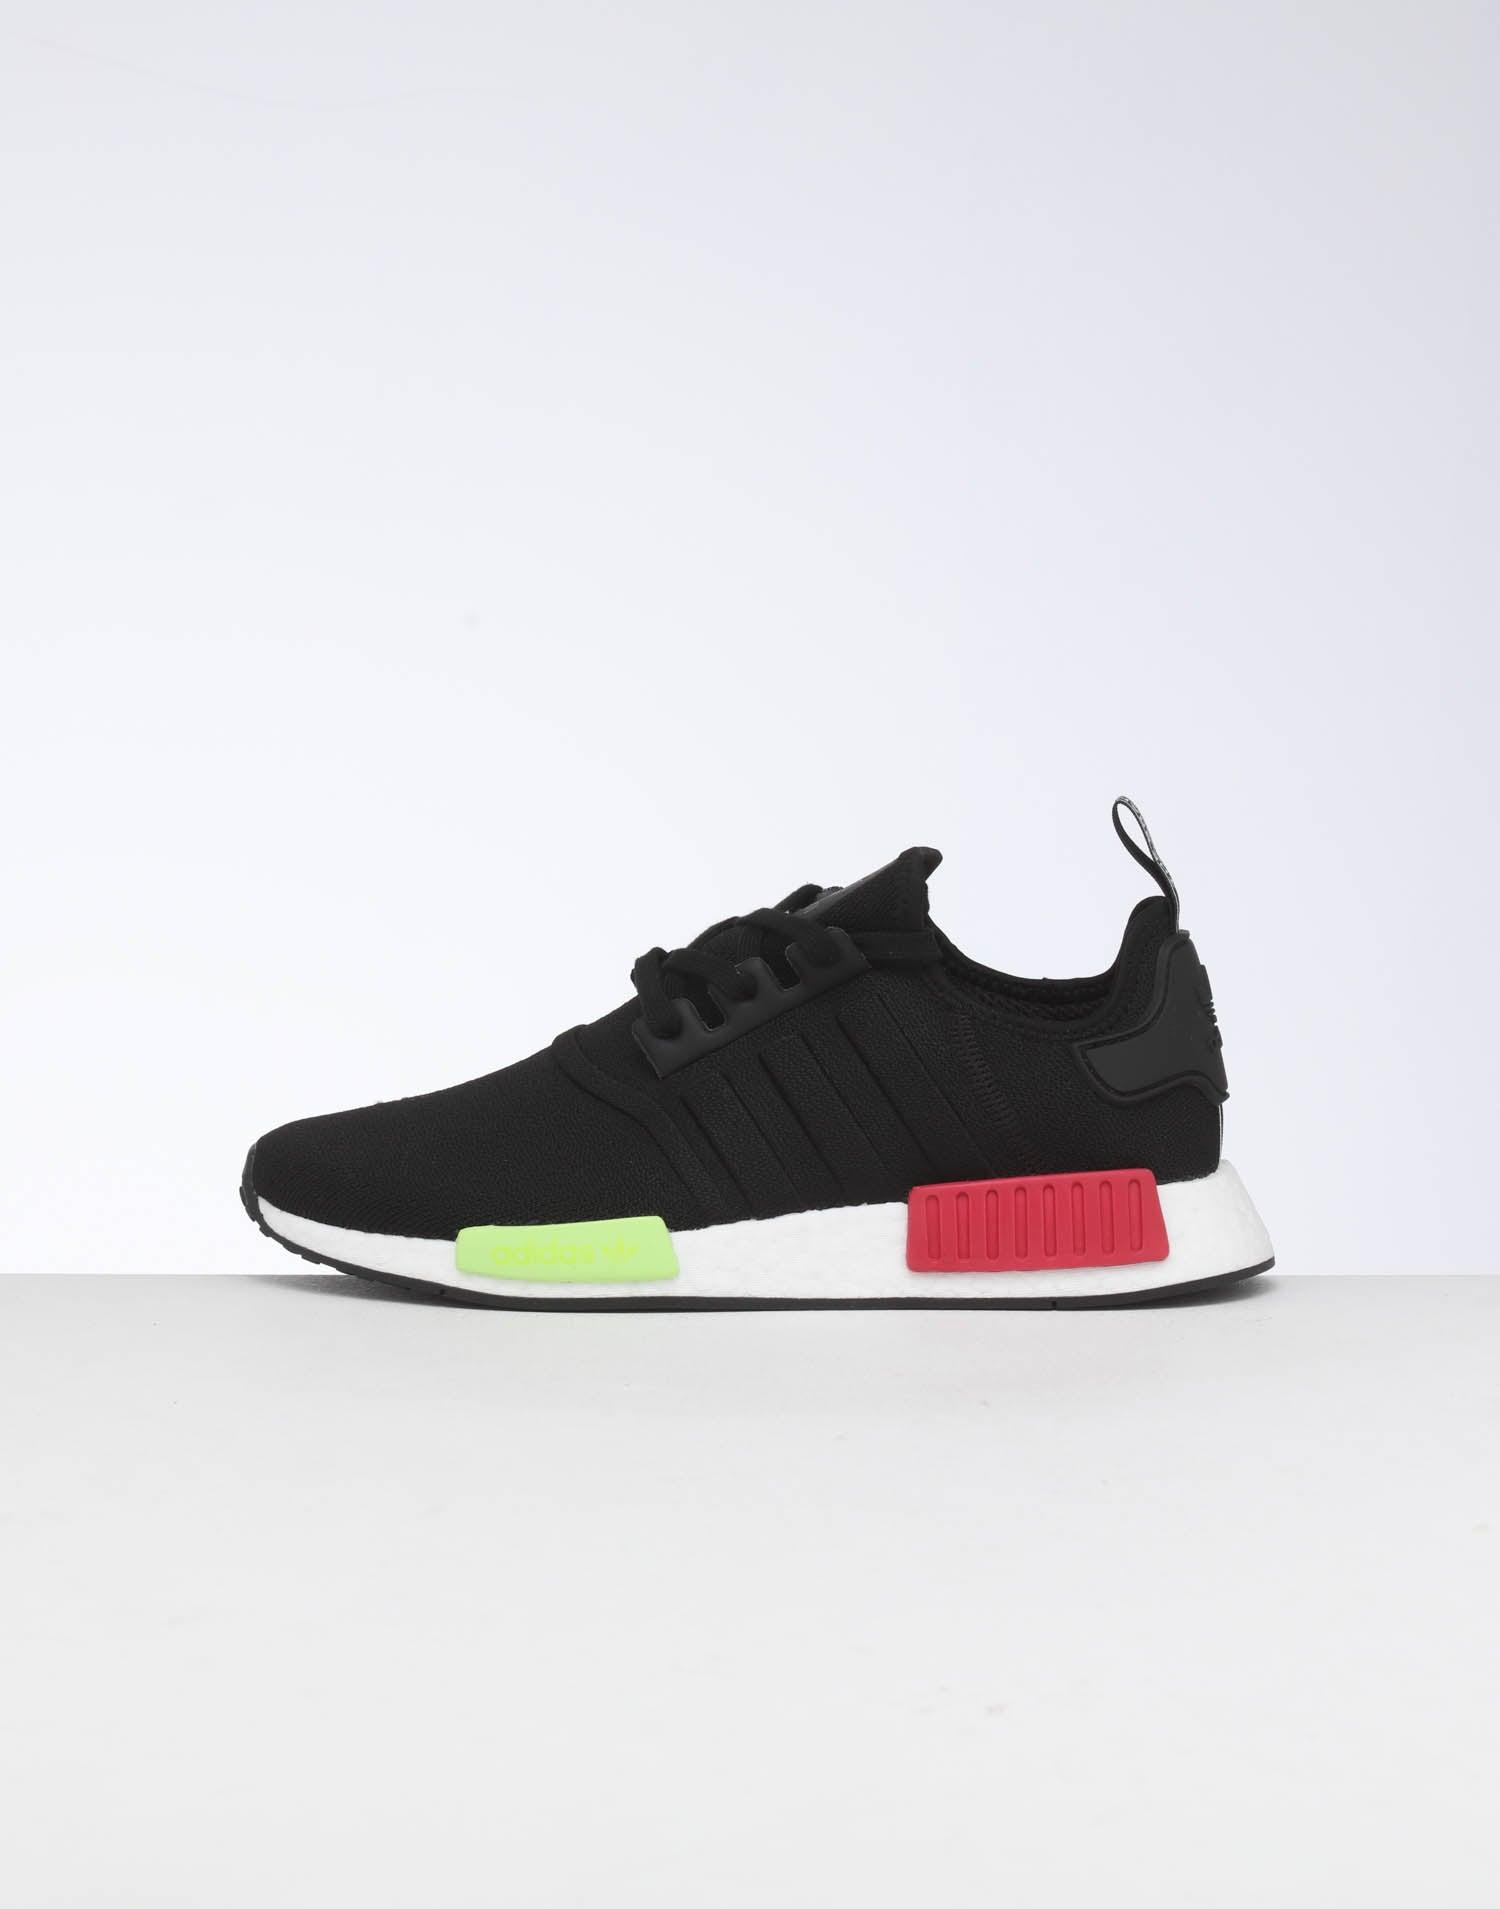 Adidas NMD_R1 BlackBlackPink